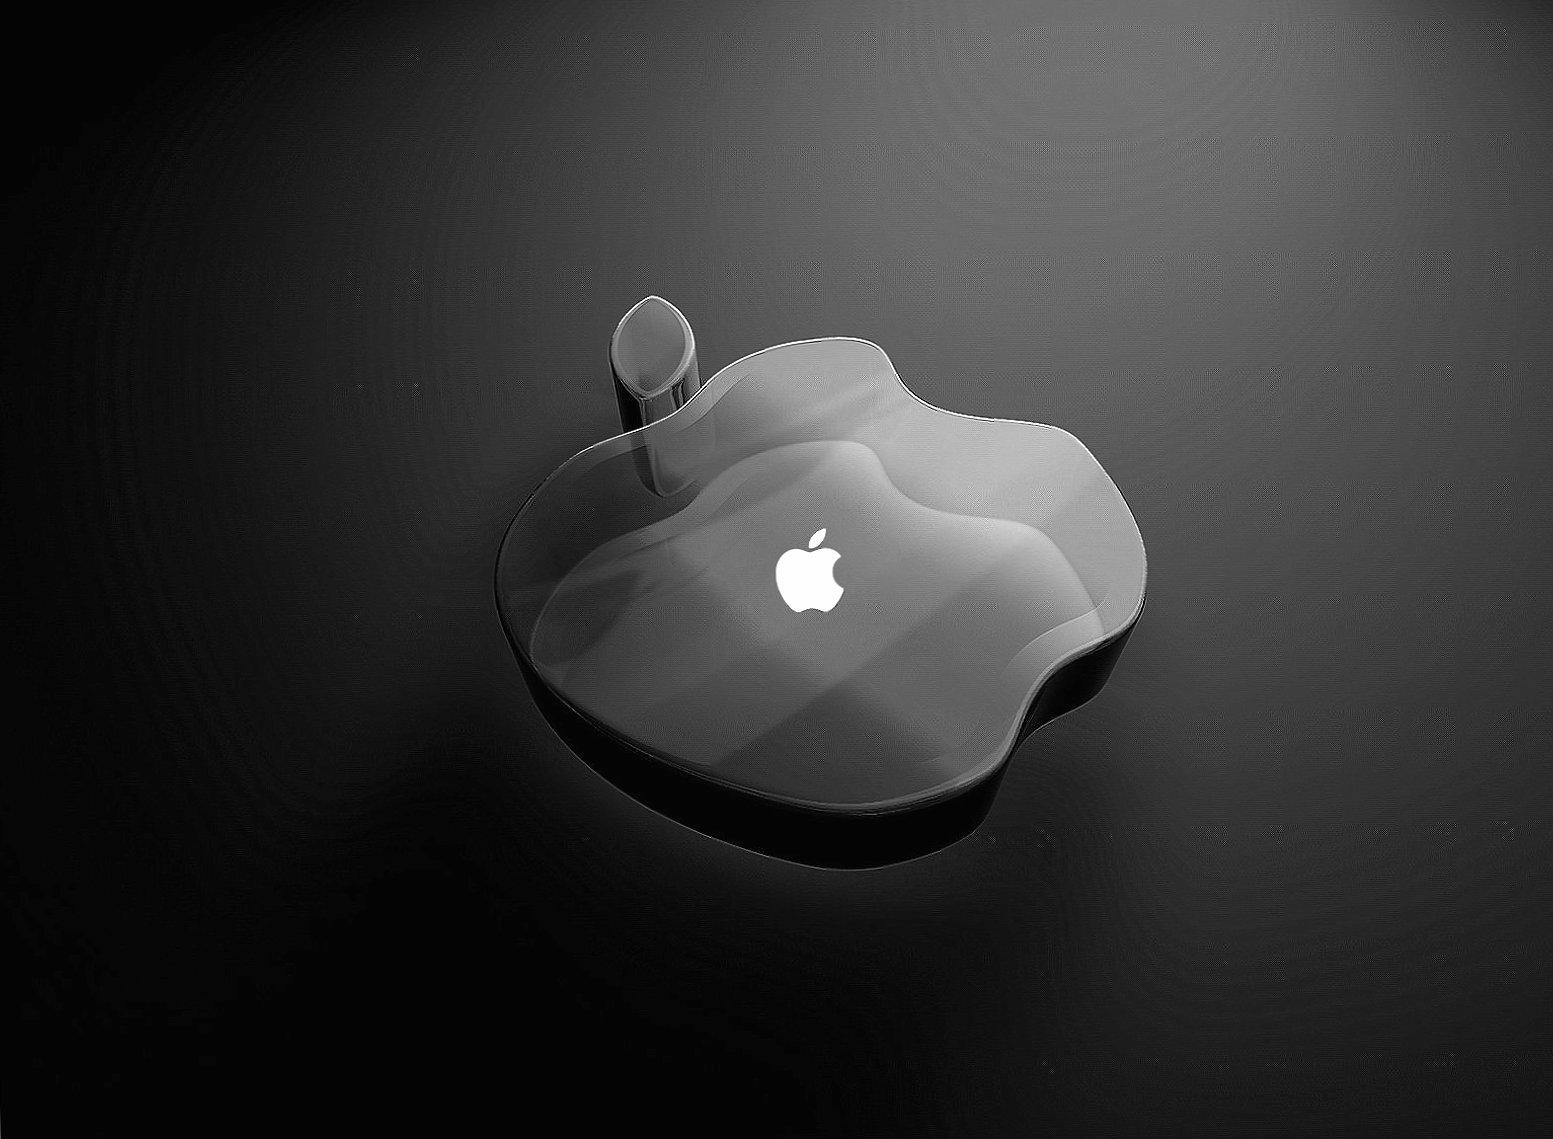 Liquid apple wallpapers HD quality